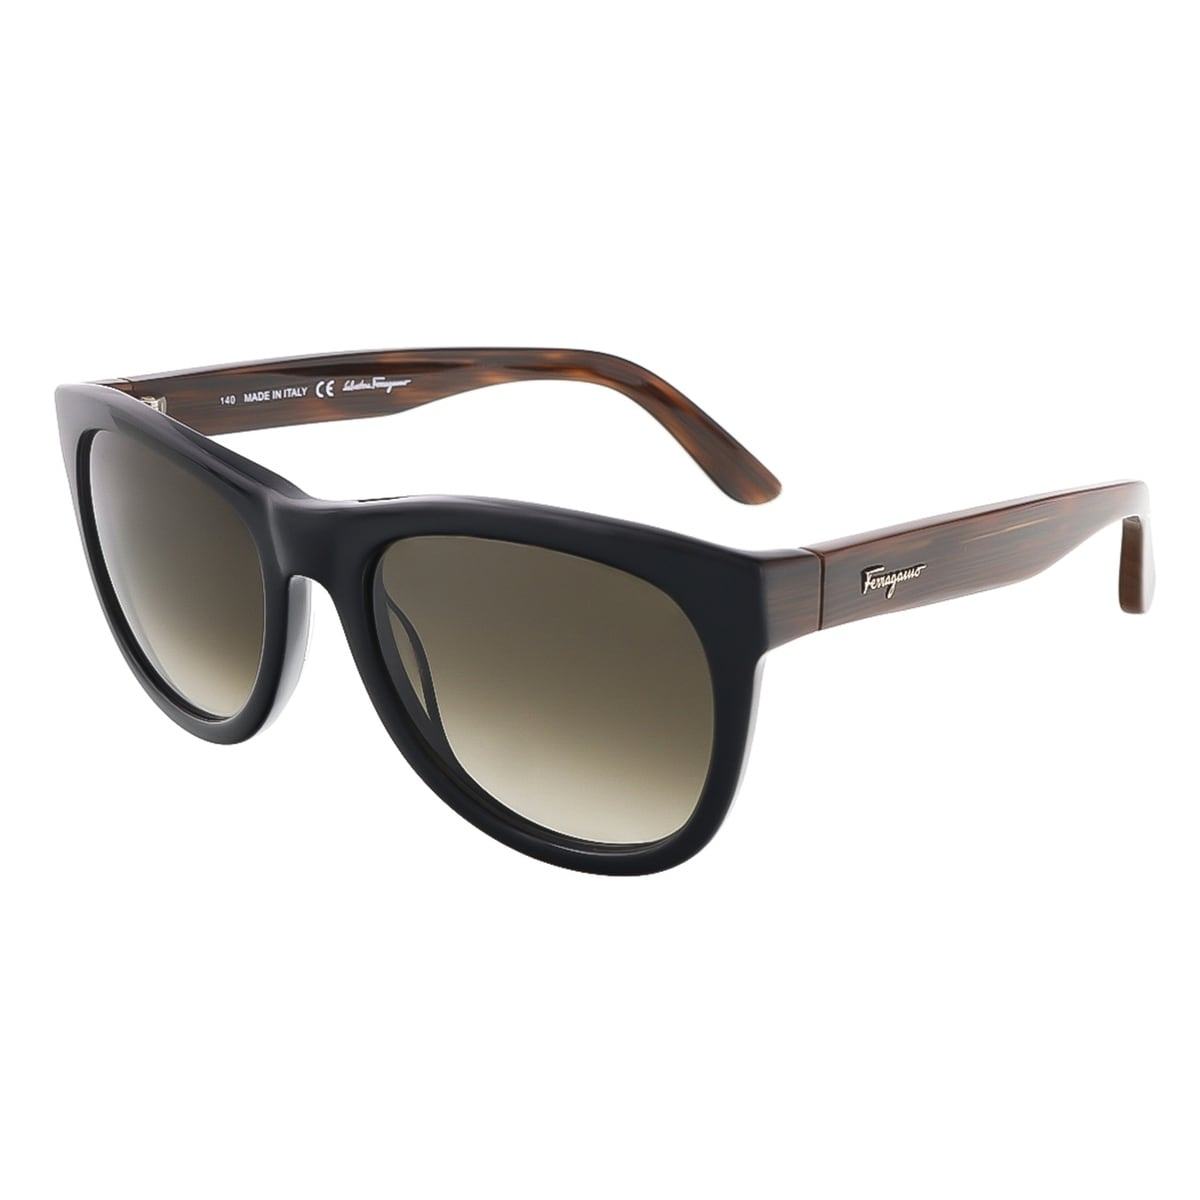 5af4e14b2ae Shop Salvatore Ferragamo SF685S 001 Black Rectangle sunglasses ...